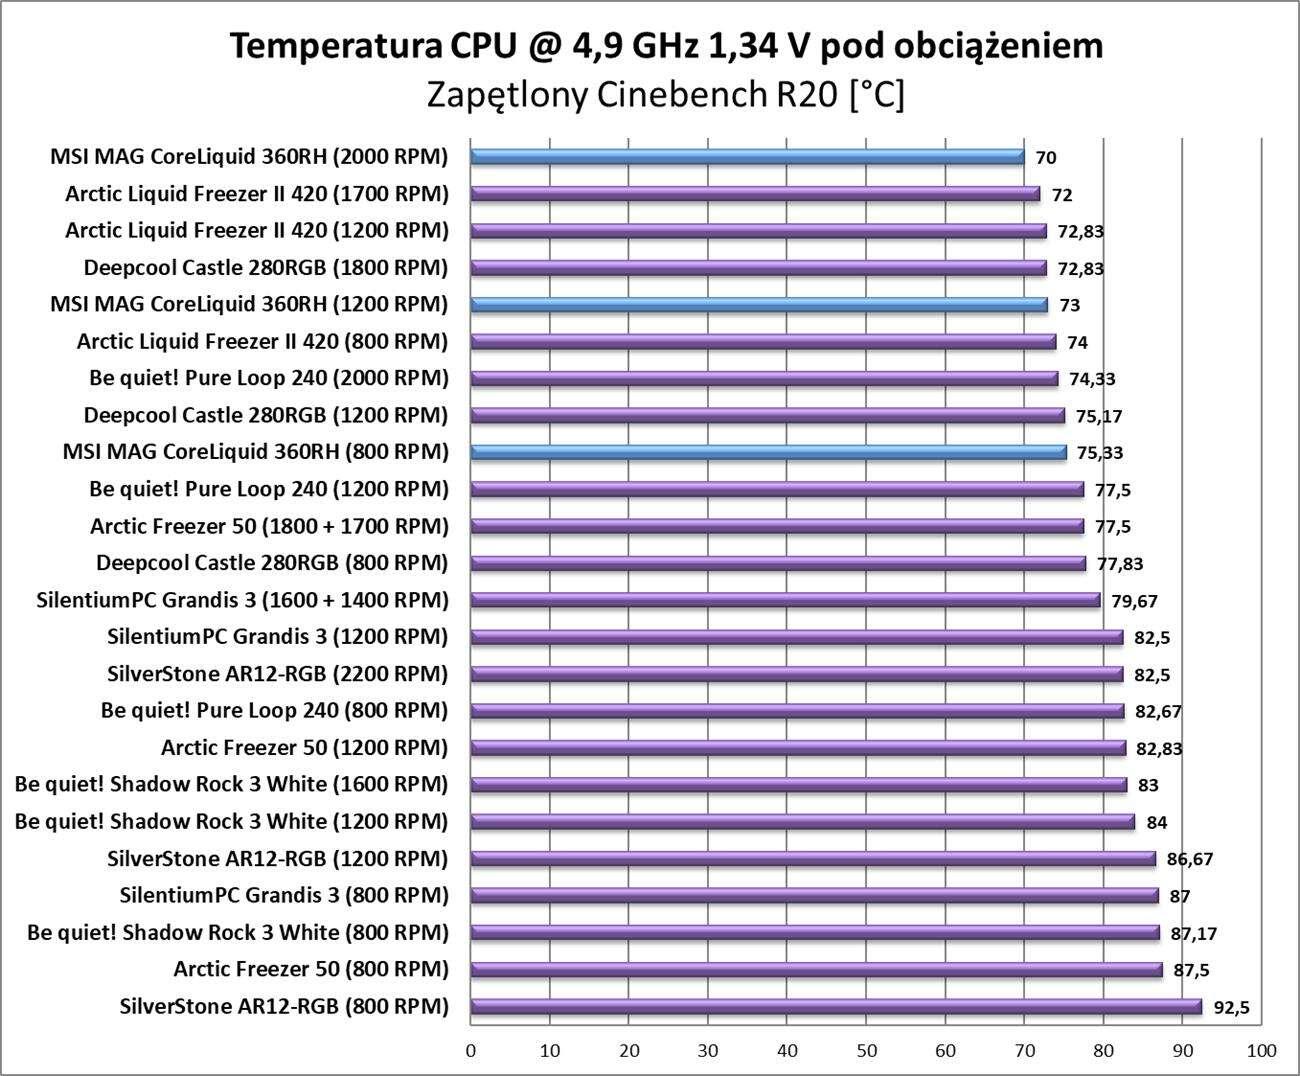 Test chłodzenia MSI MAG CoreLiquid 360RH